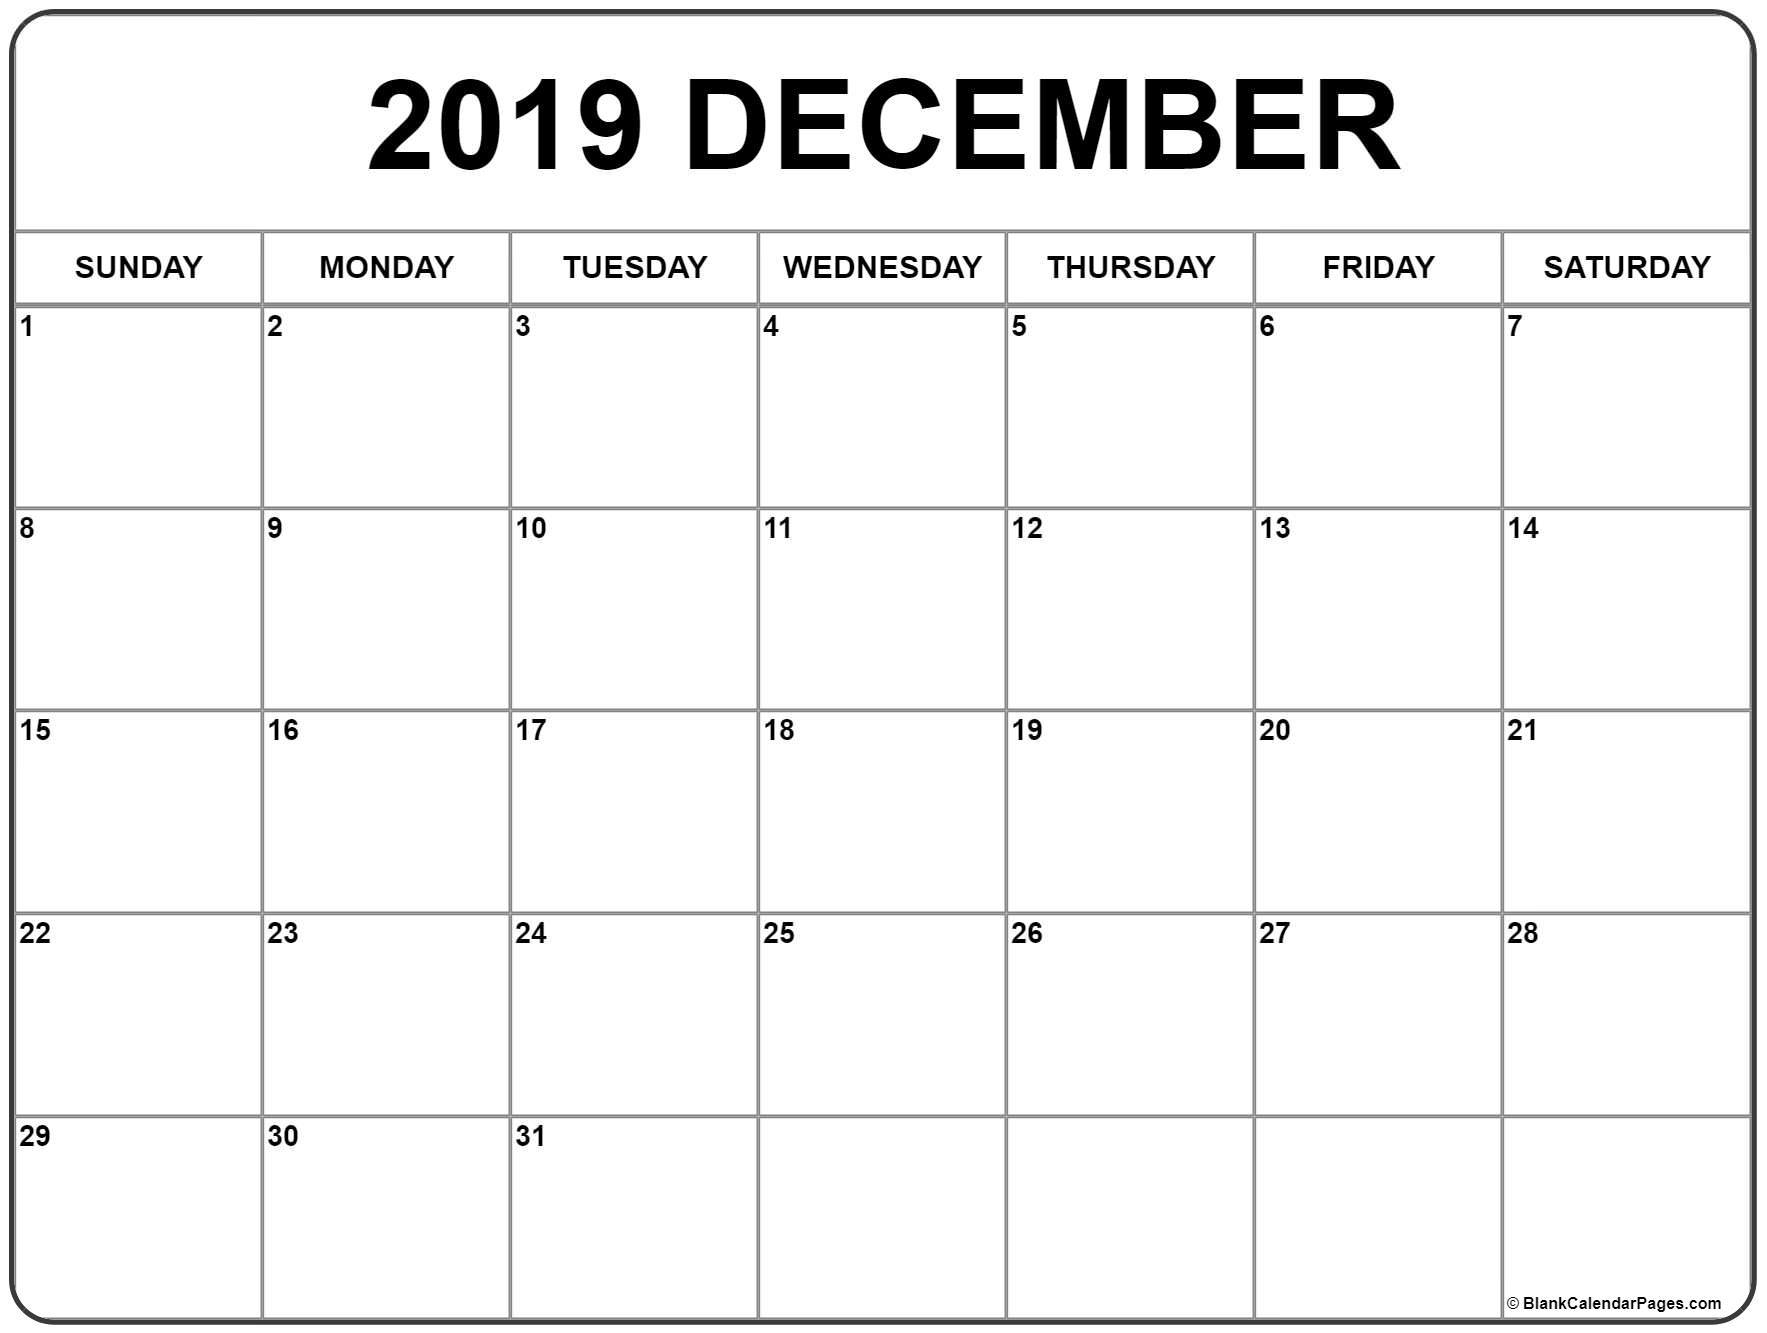 December 2019 Printable Calendar - Create Your Calendar For for 2019 Free Printable Calendars Without Downloading